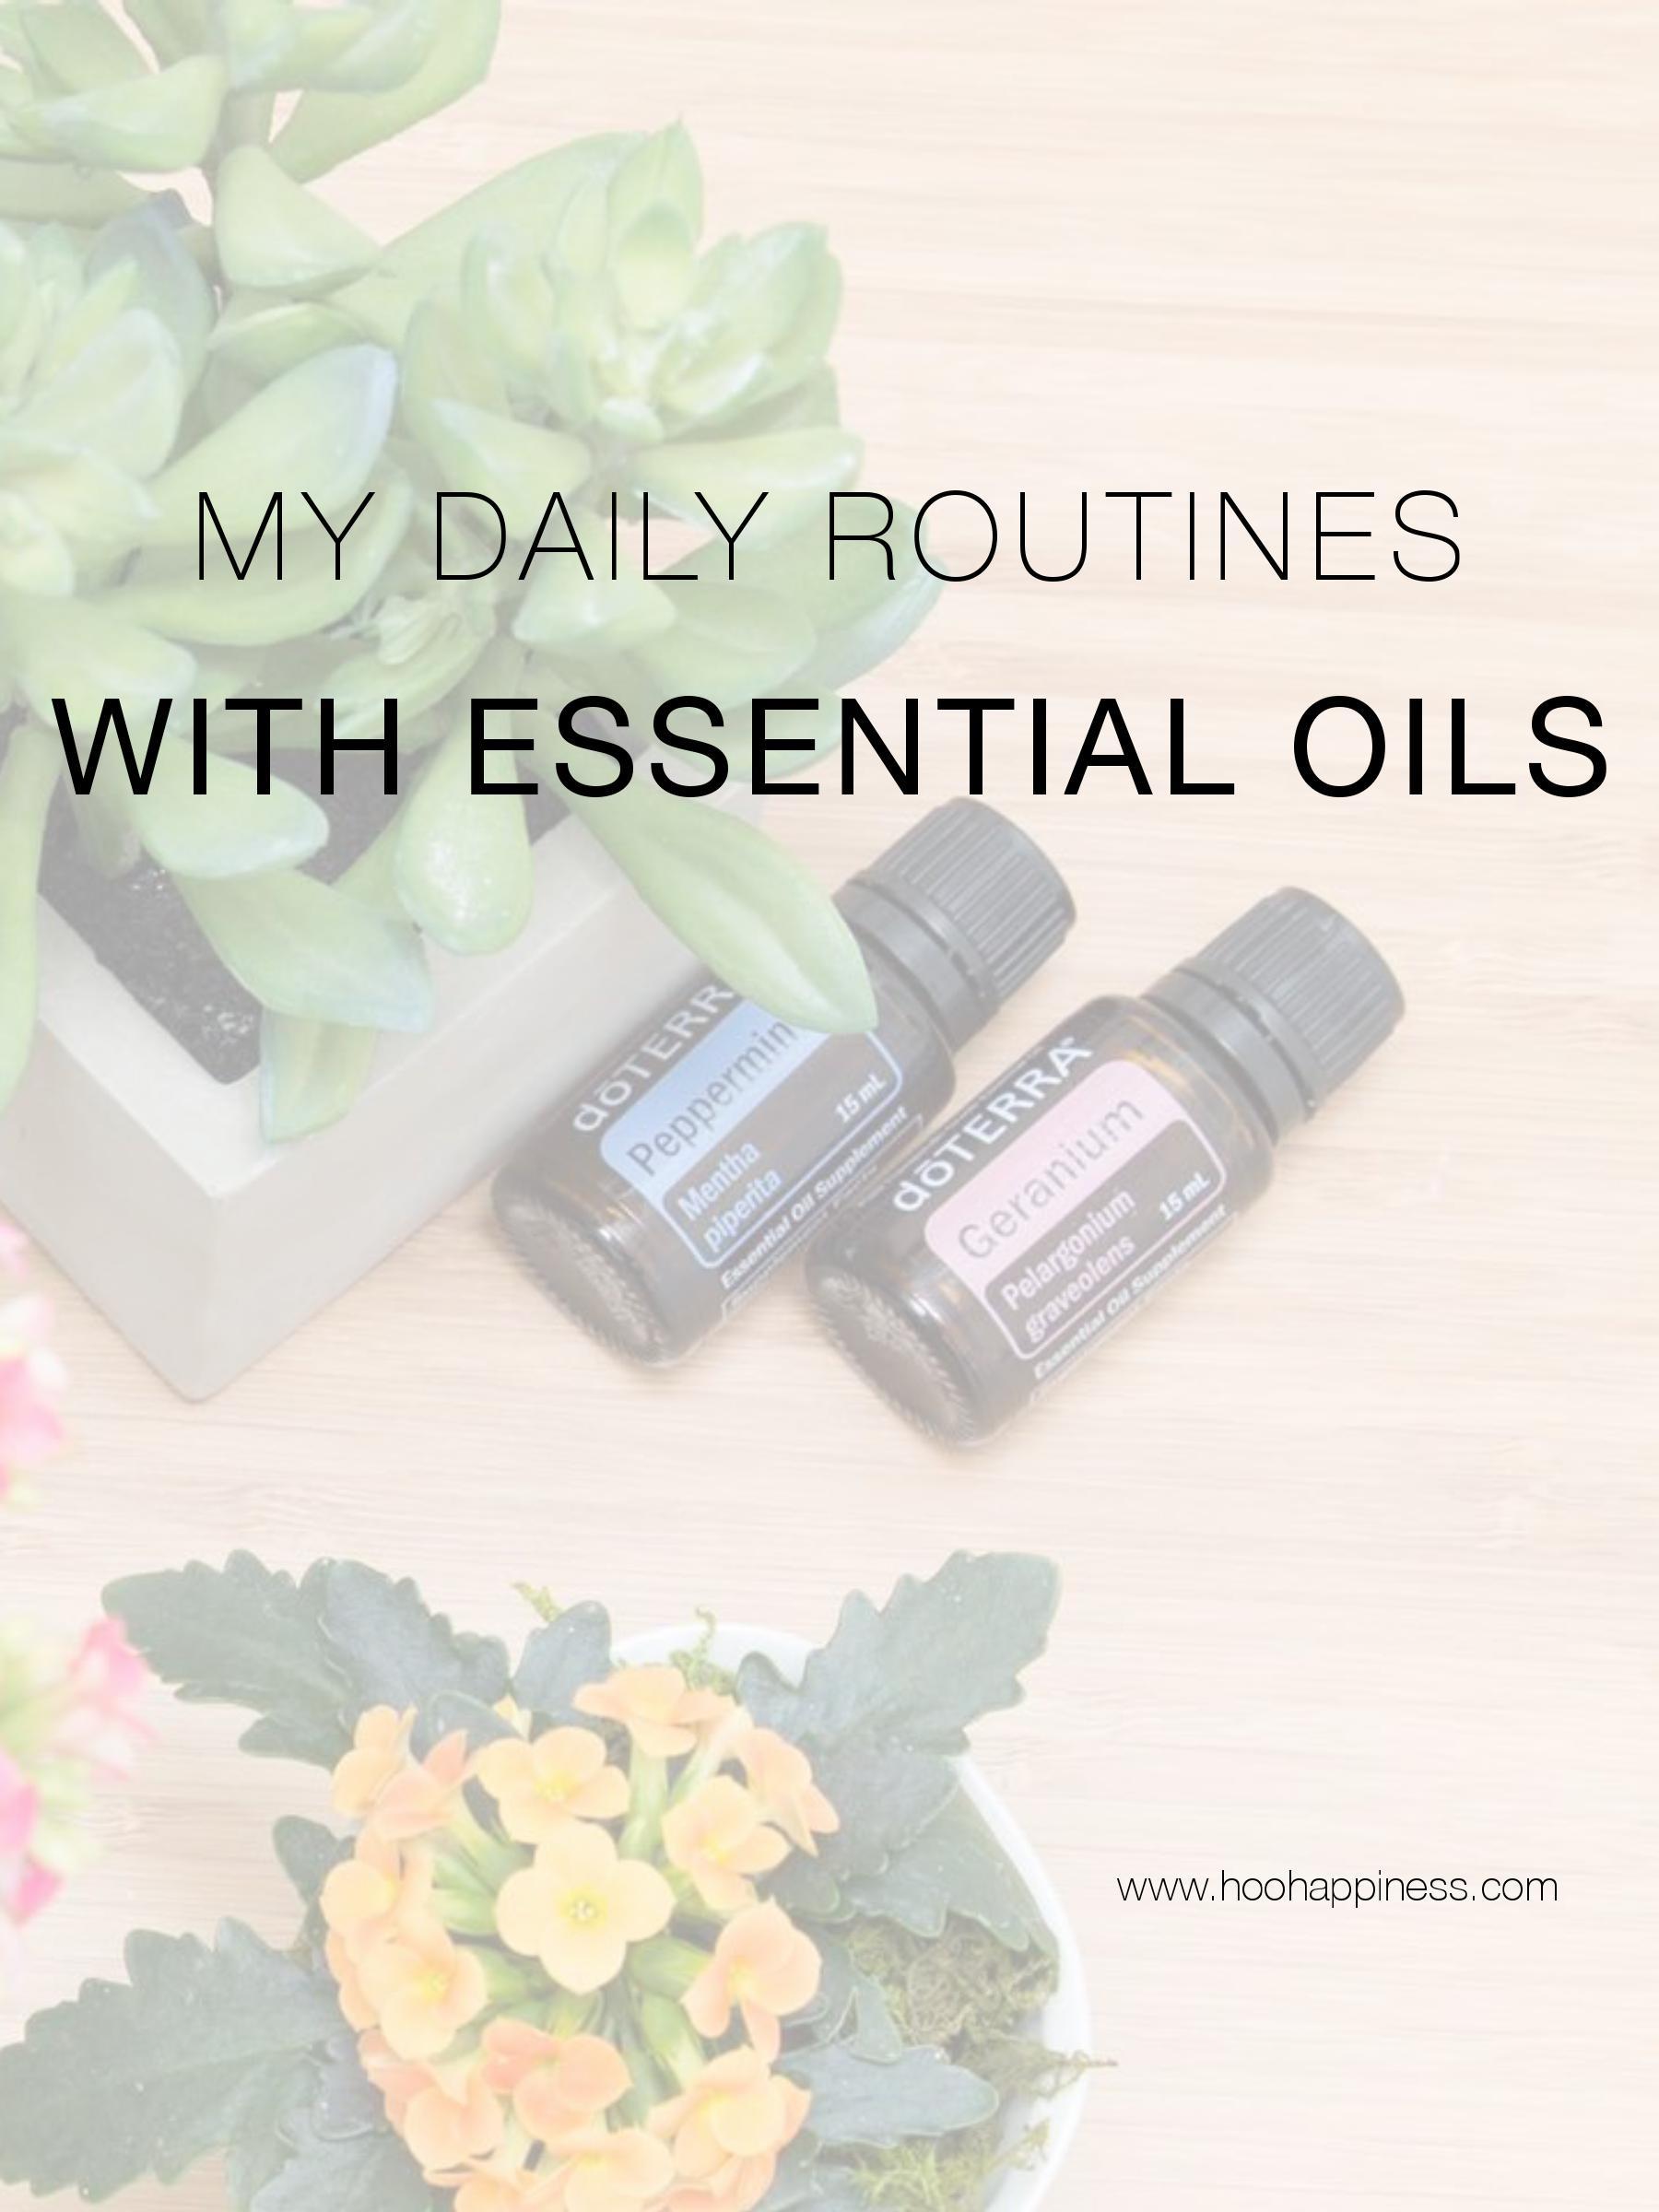 My Daily Routine using dōTERRA Essential Oils